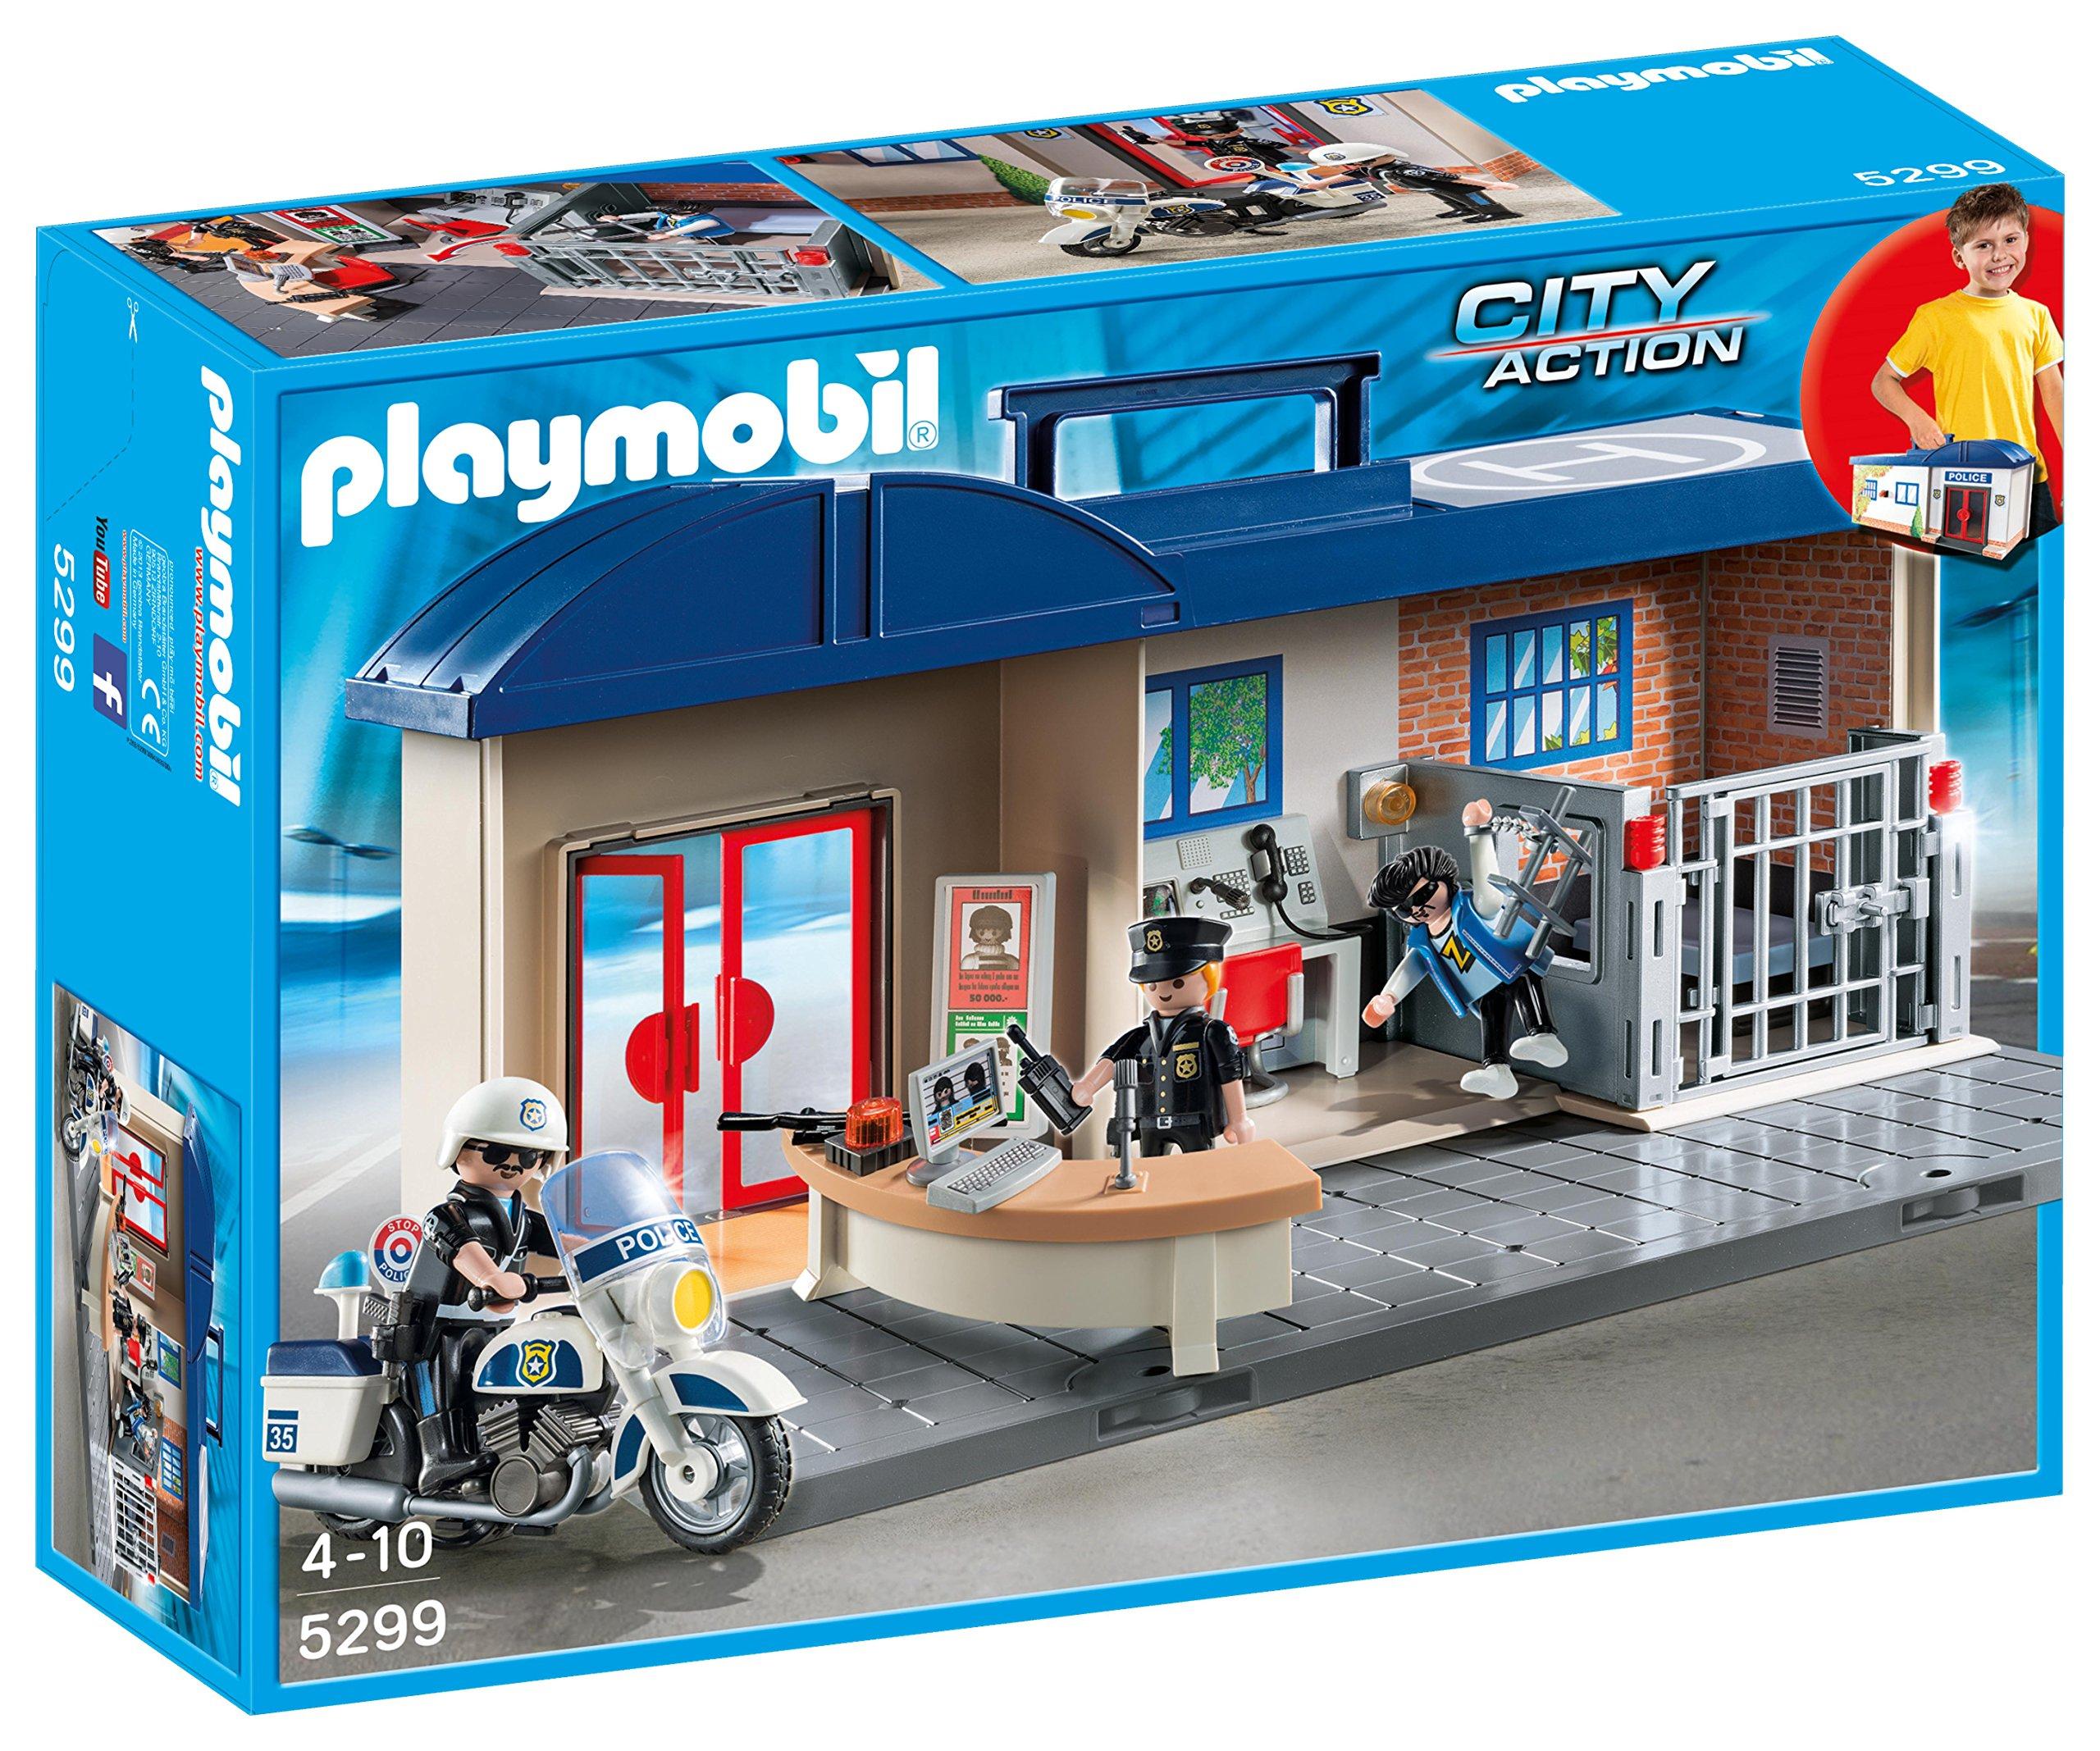 Playmobil - Maletín jefatura de policía (5299) product image